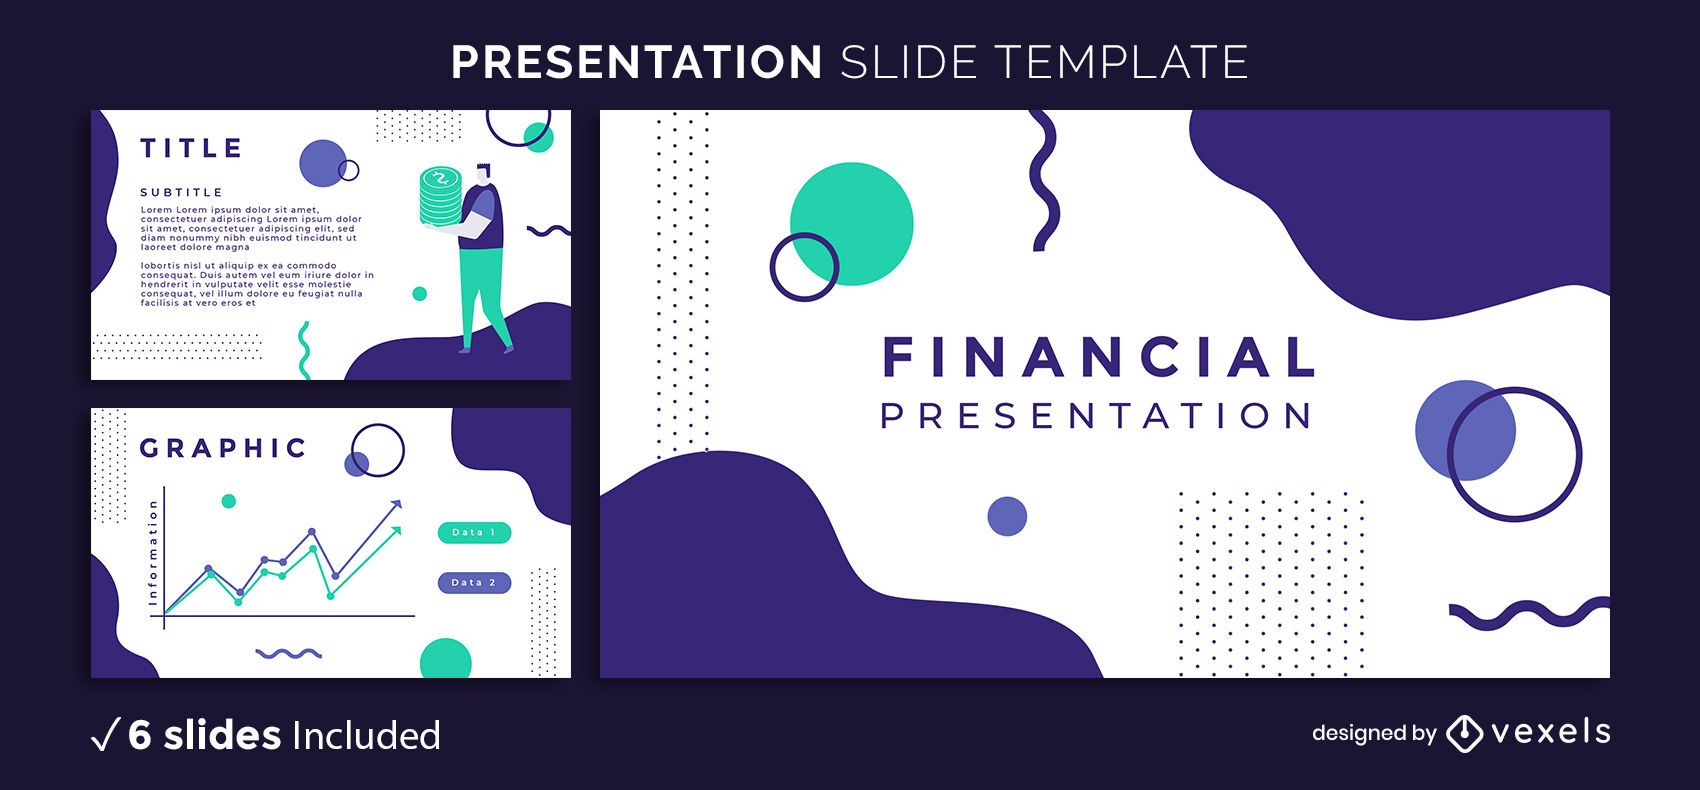 Abstract Financial Presentation